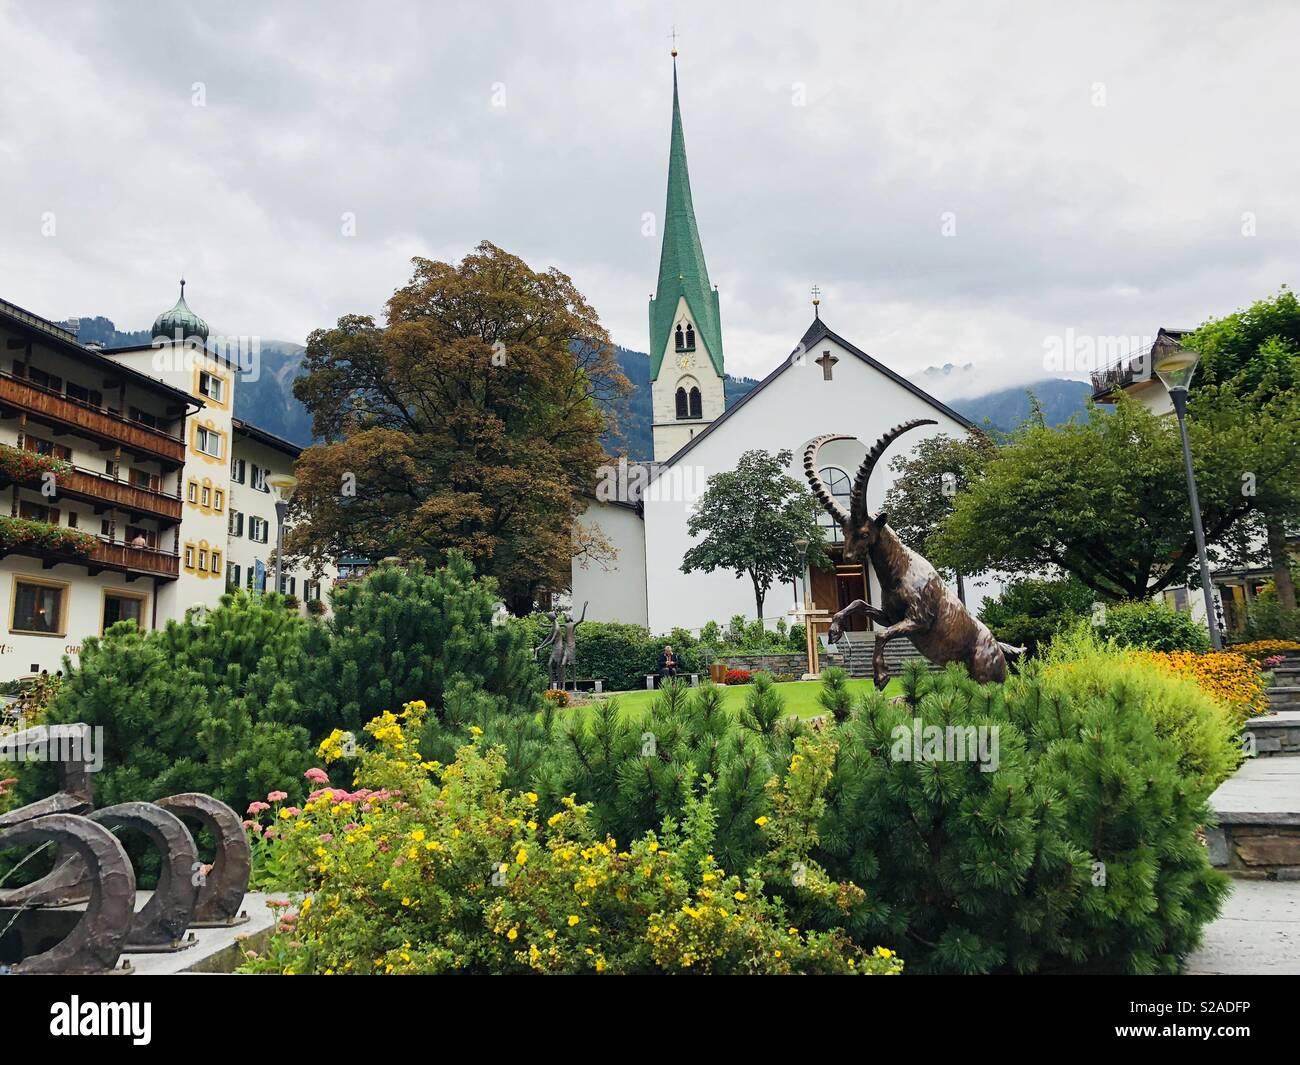 Mayrhofen Austria - Stock Image